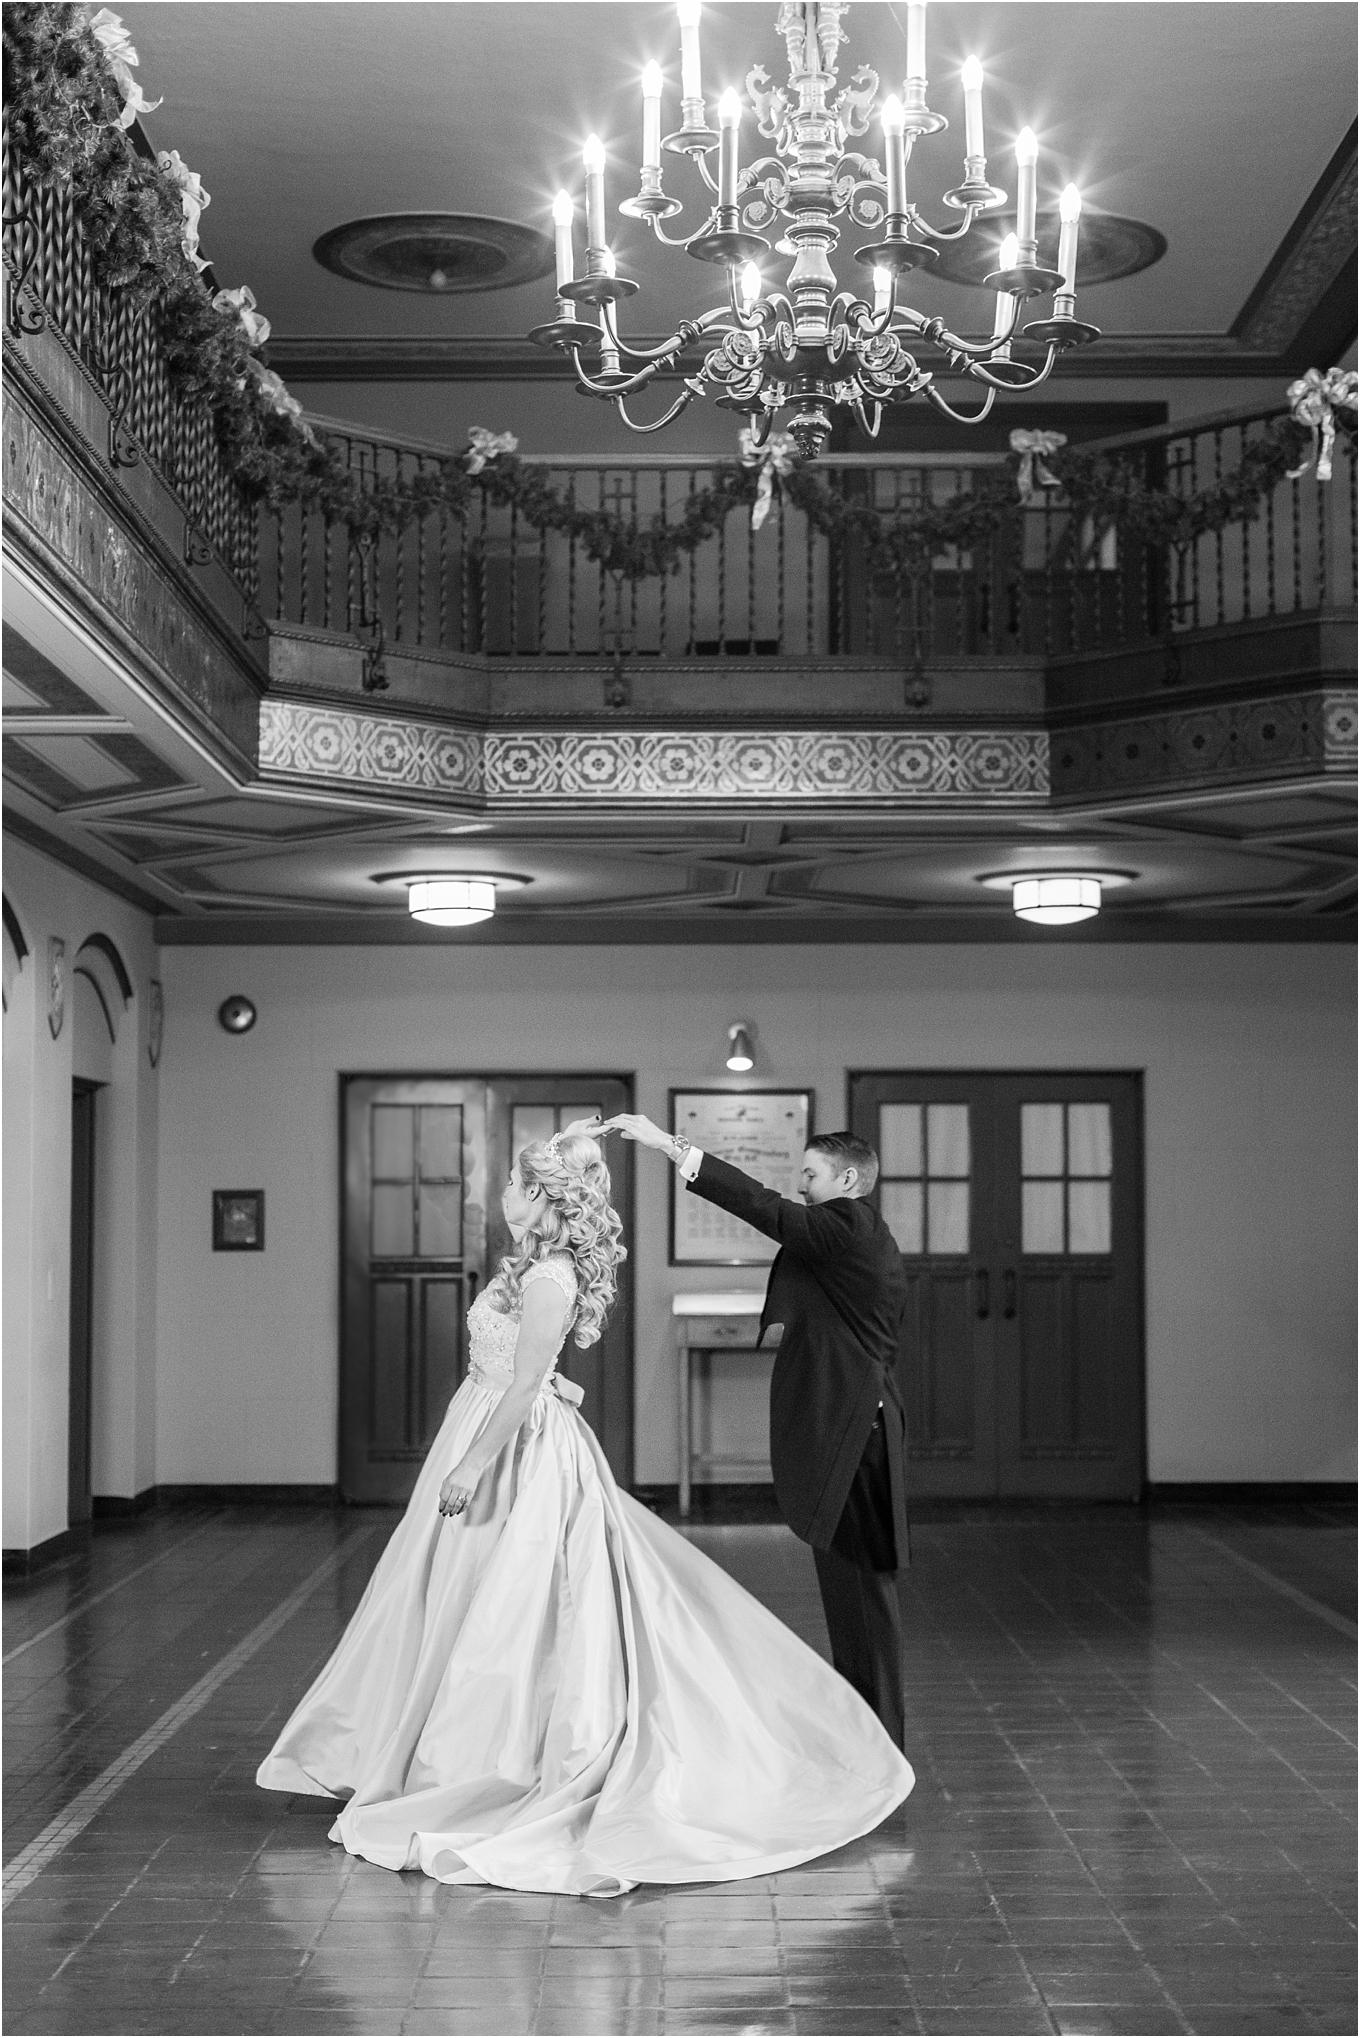 elegant-classic-fairytale-wedding-photos-in-detroit-mi-at-the-masonic-temple-by-courtney-carolyn-photography_0060.jpg